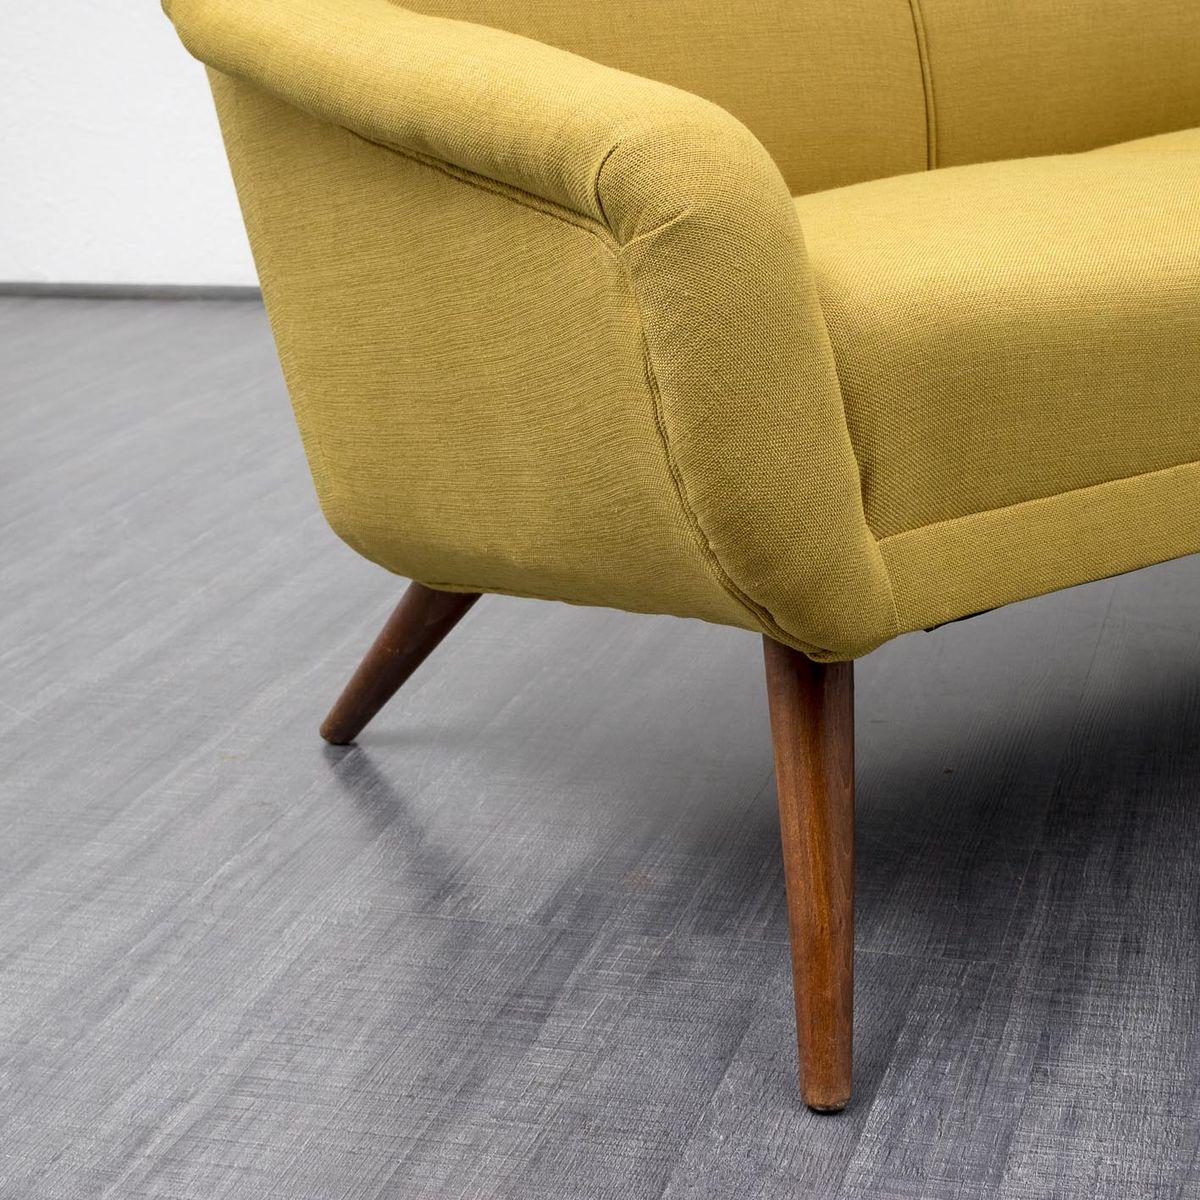 gr n gelbe vintage couch 1950er bei pamono kaufen. Black Bedroom Furniture Sets. Home Design Ideas